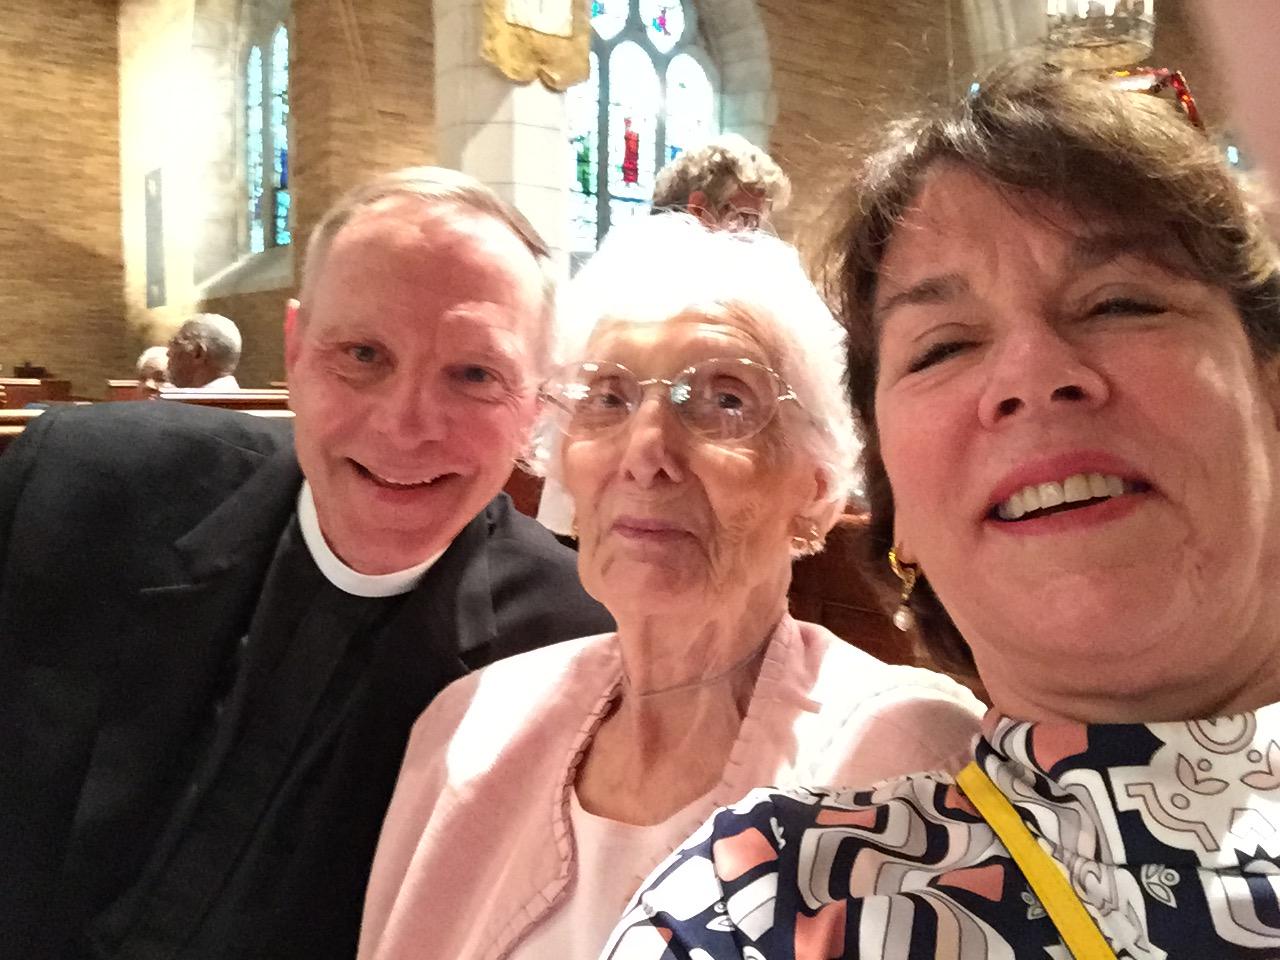 Celebrating lifetimes of service: Joan and David Carpenter